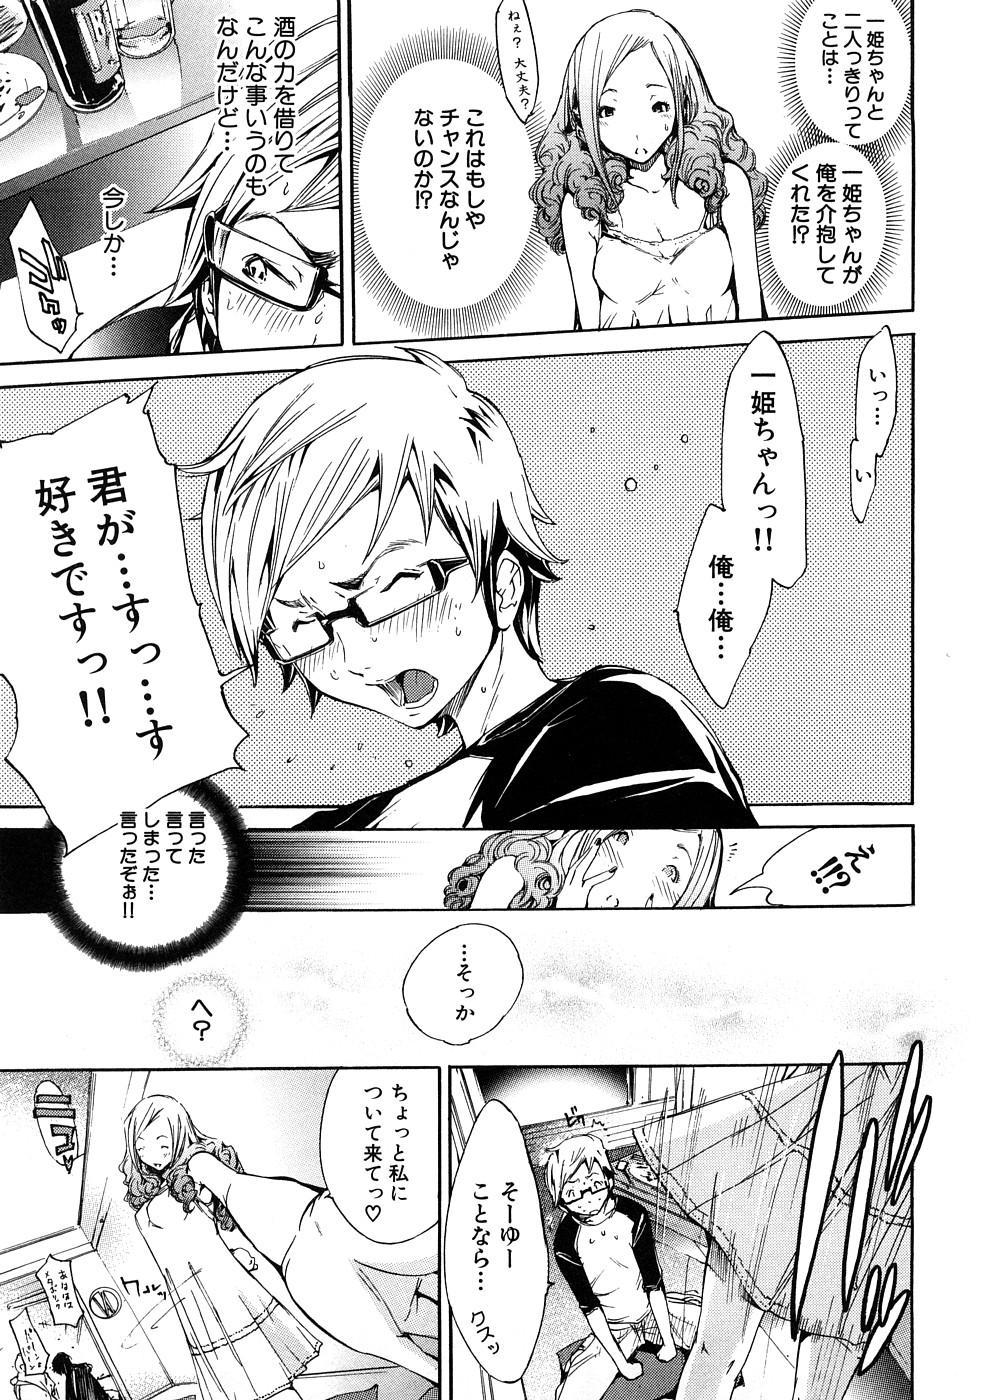 Geki Yaba Anthology Vol. 1 - Naka ni Dashite yo 33